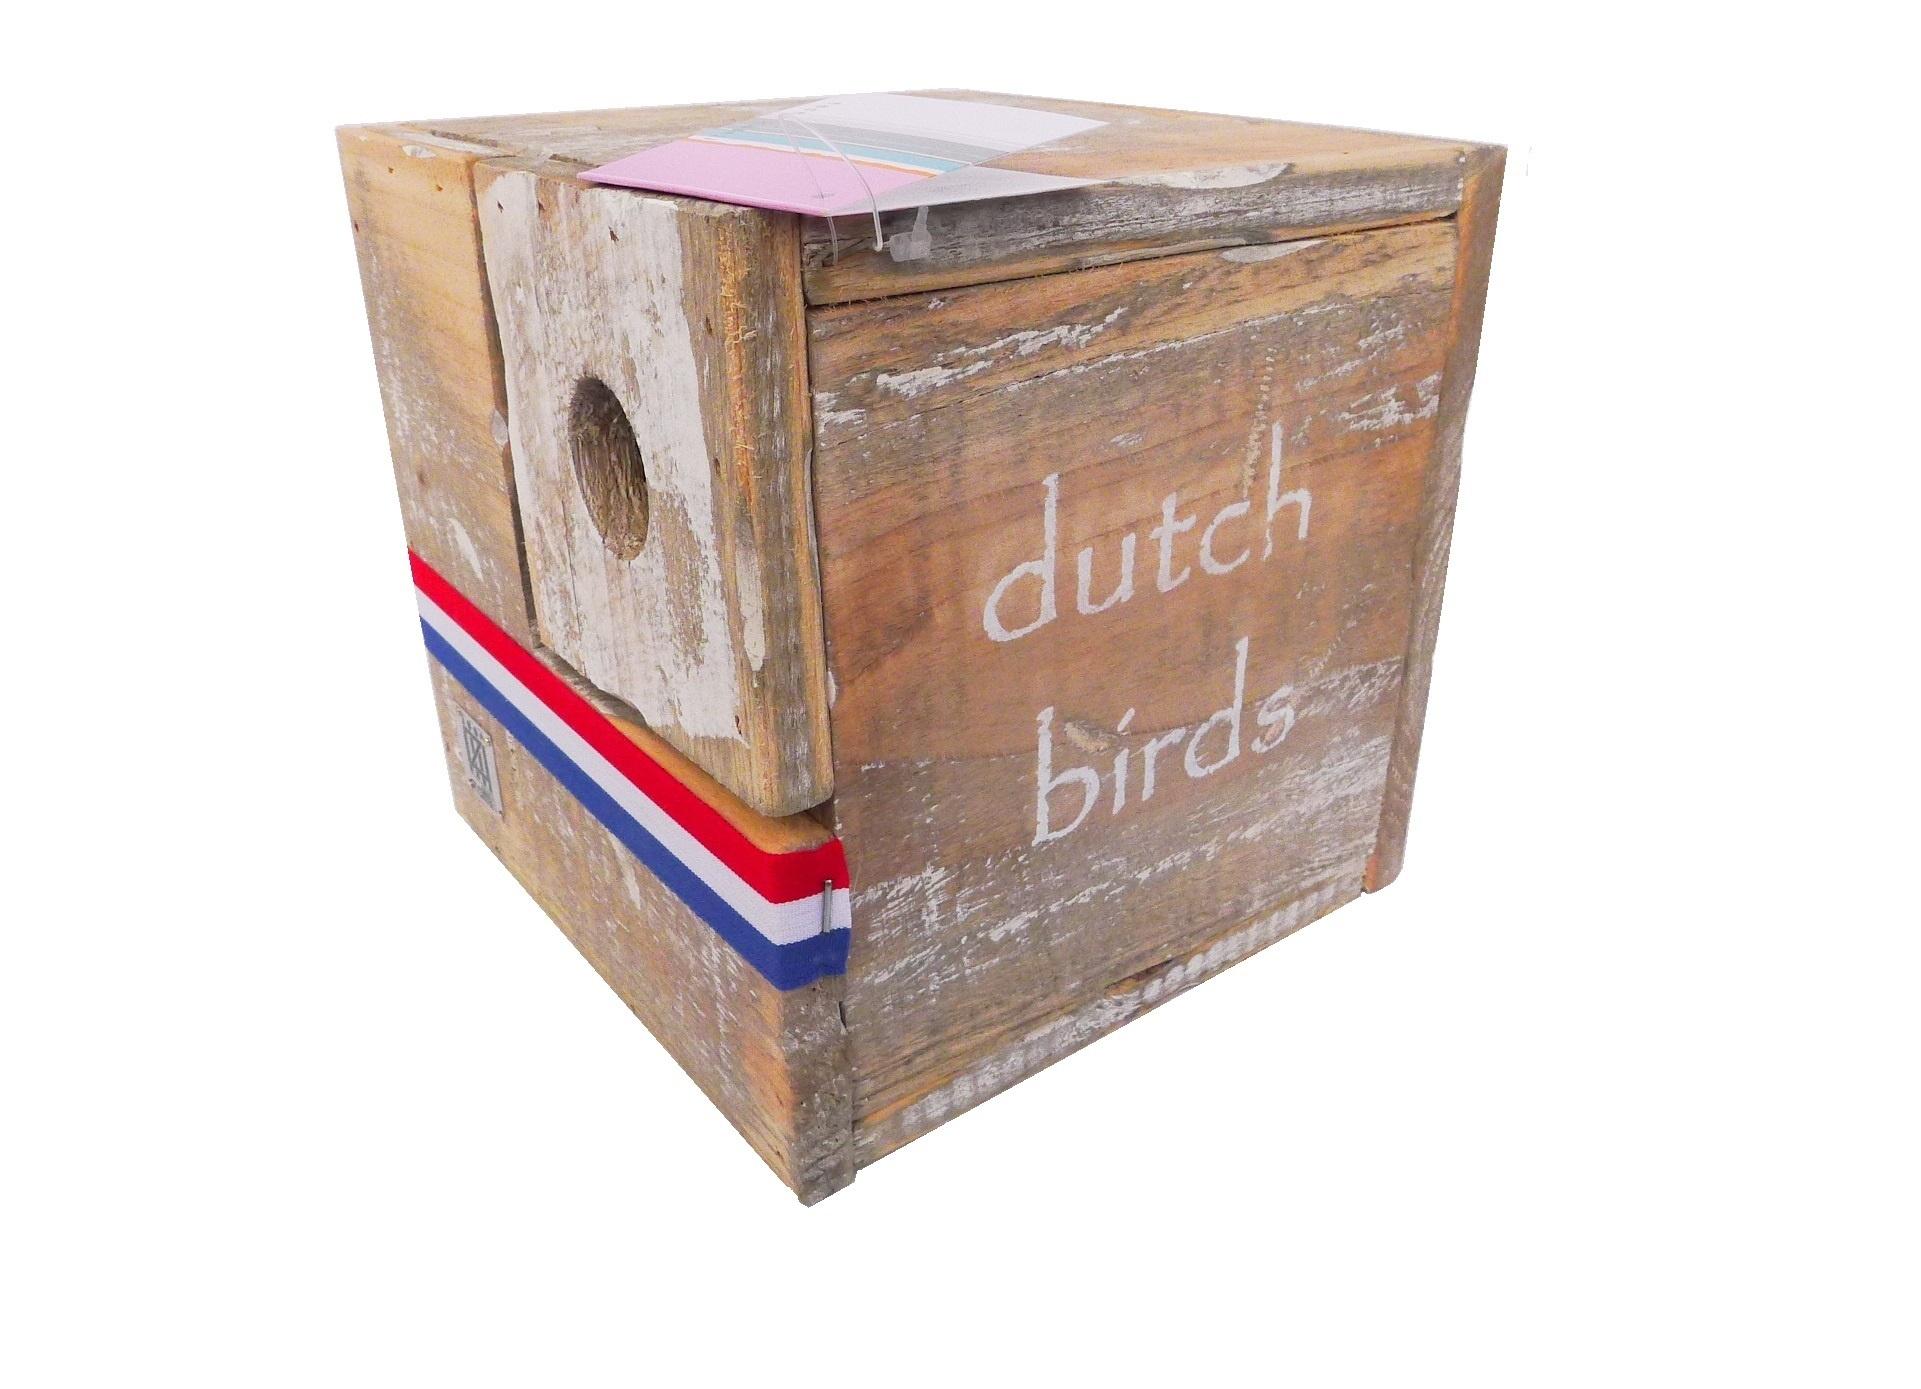 birdhouse old dutch StB square-3